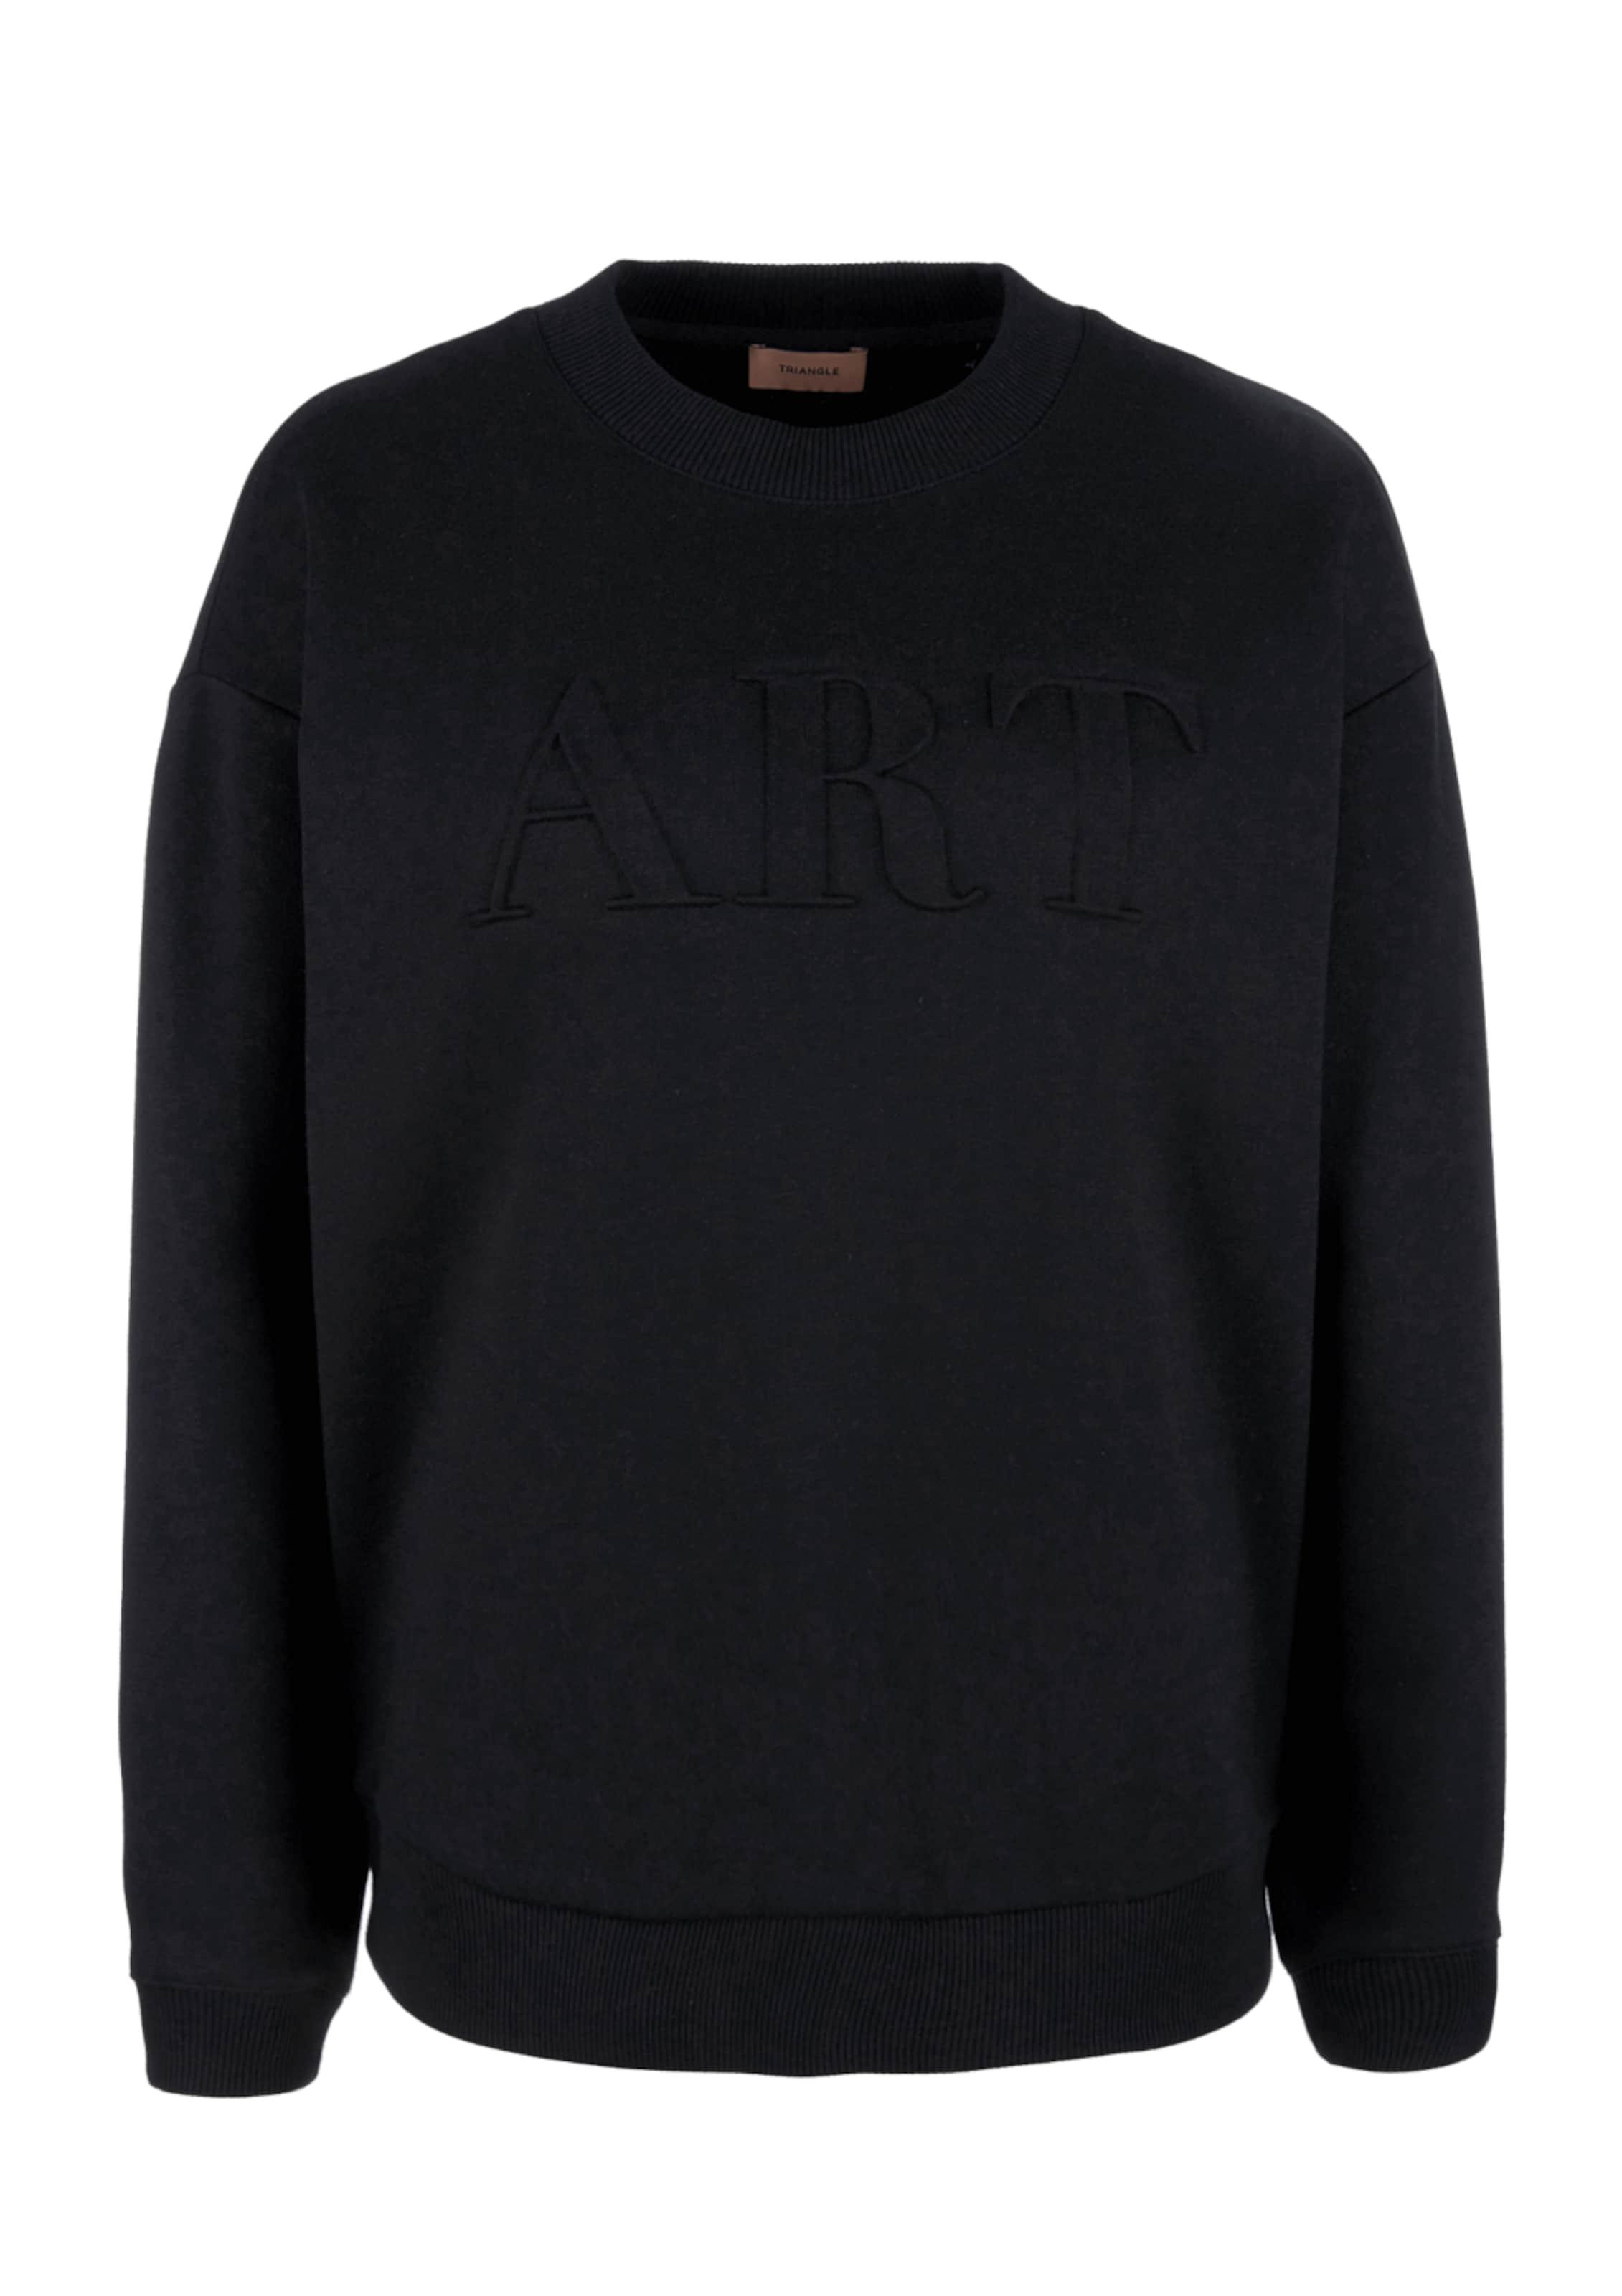 Triangle Sweatshirt Sweatshirt Triangle In In Sweatshirt In Schwarz Triangle Sweatshirt Triangle Schwarz In Schwarz shCtrxdQ